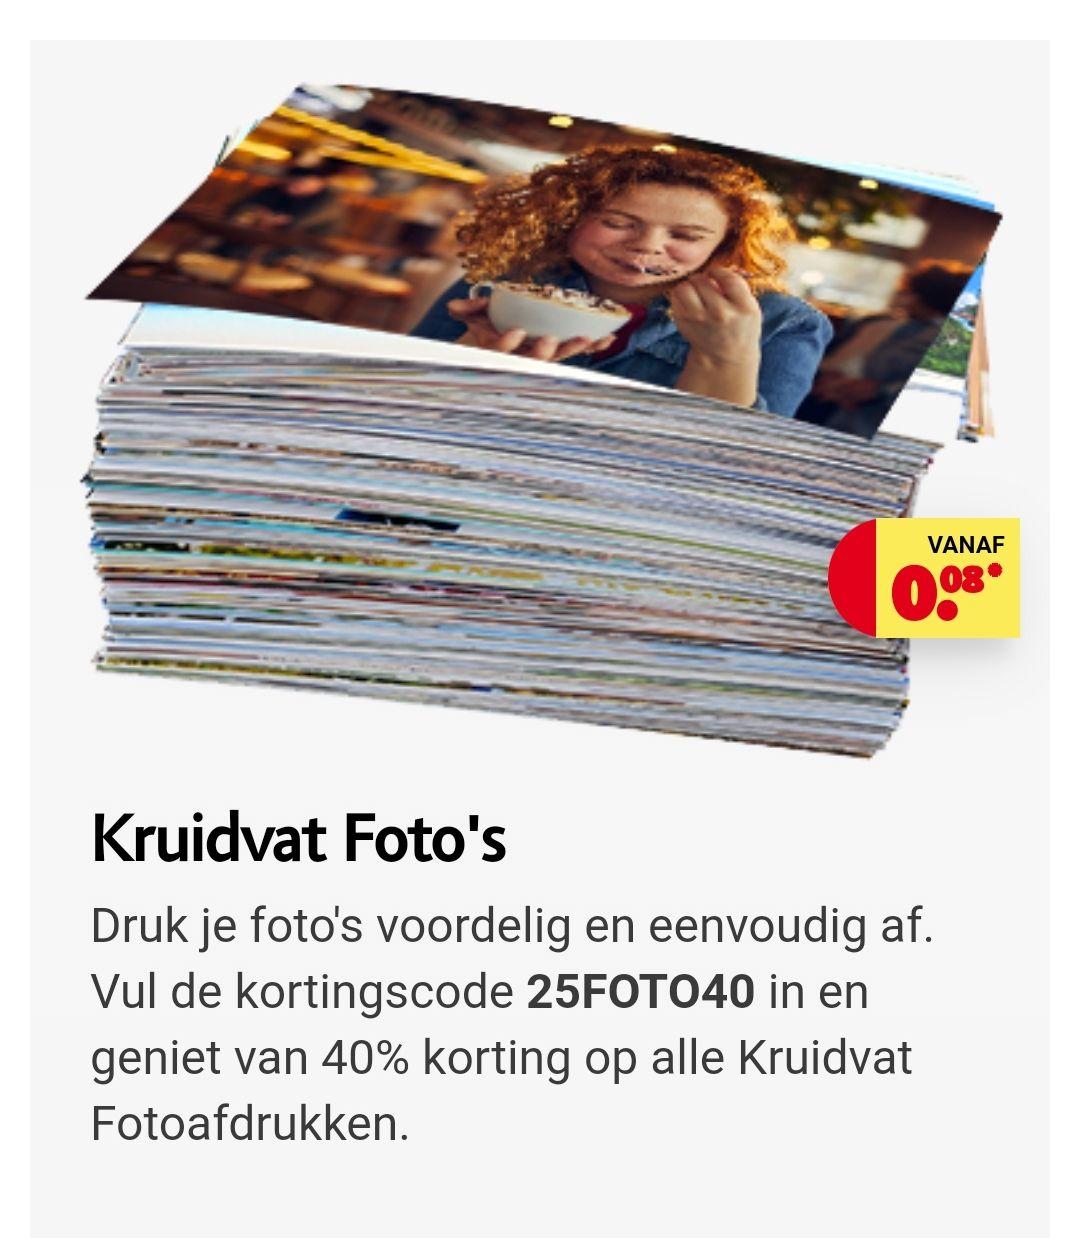 40% korting foto afdrukken kruidvat site bv 100 stuks